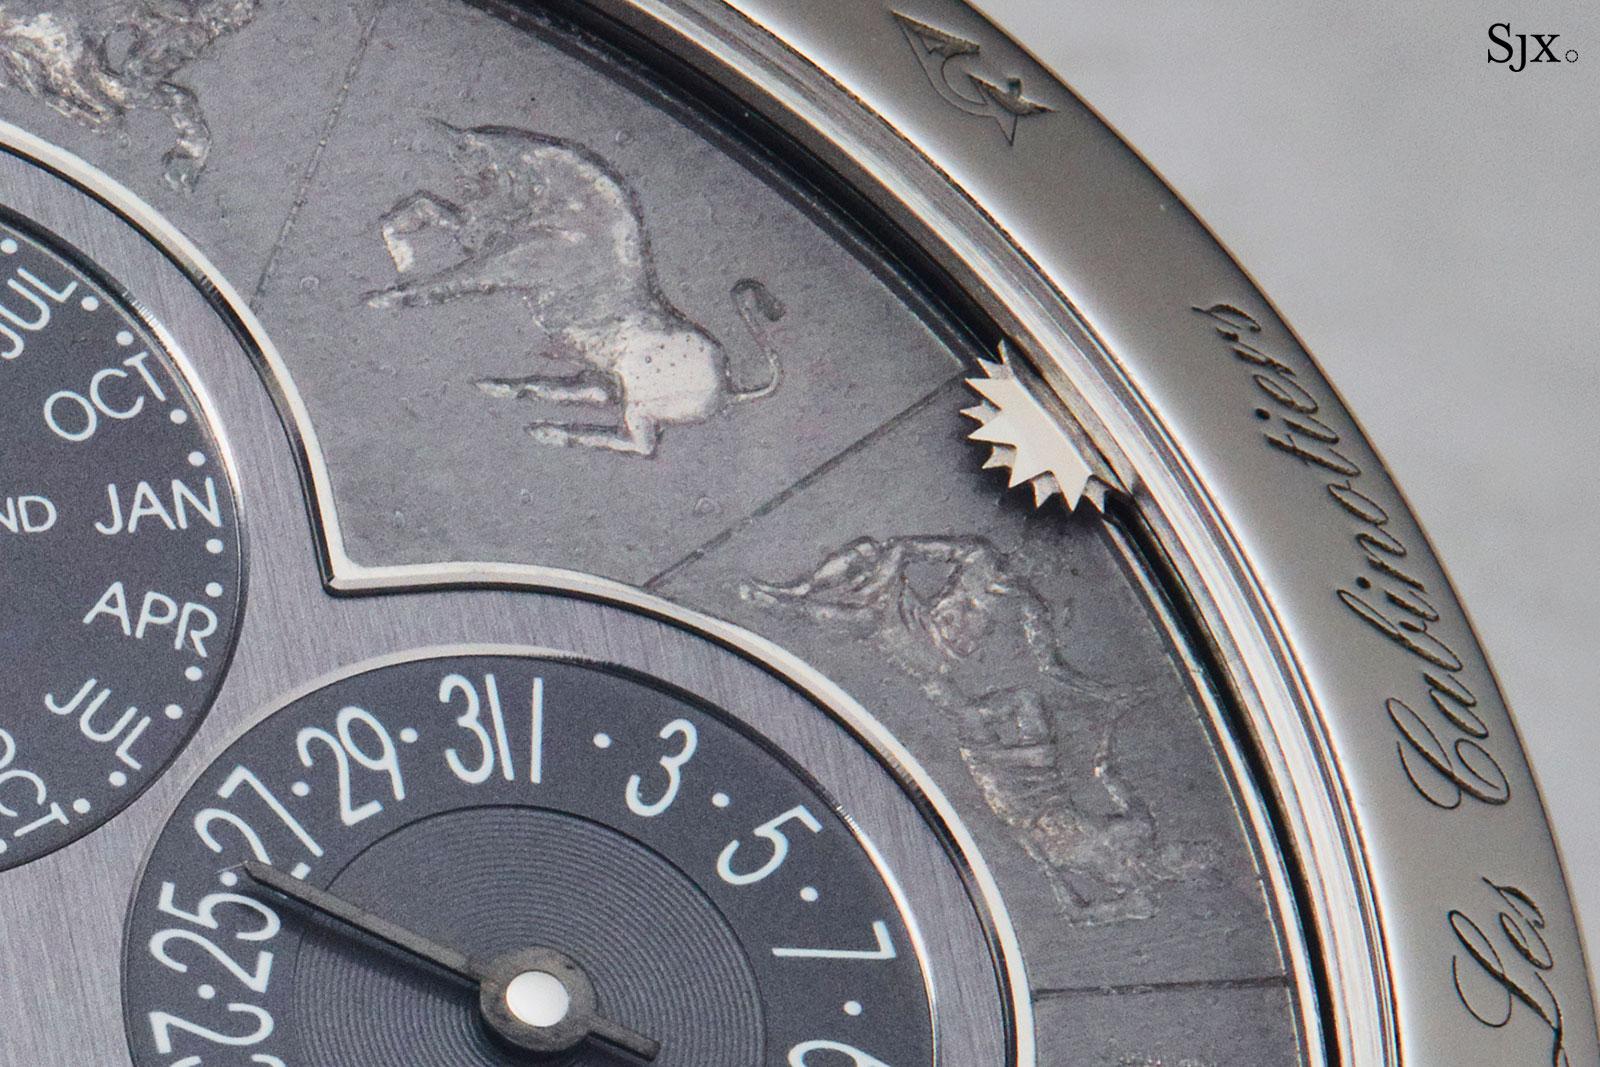 Vacheron Constantin Cabinotiers grand complication 30016-000P 8